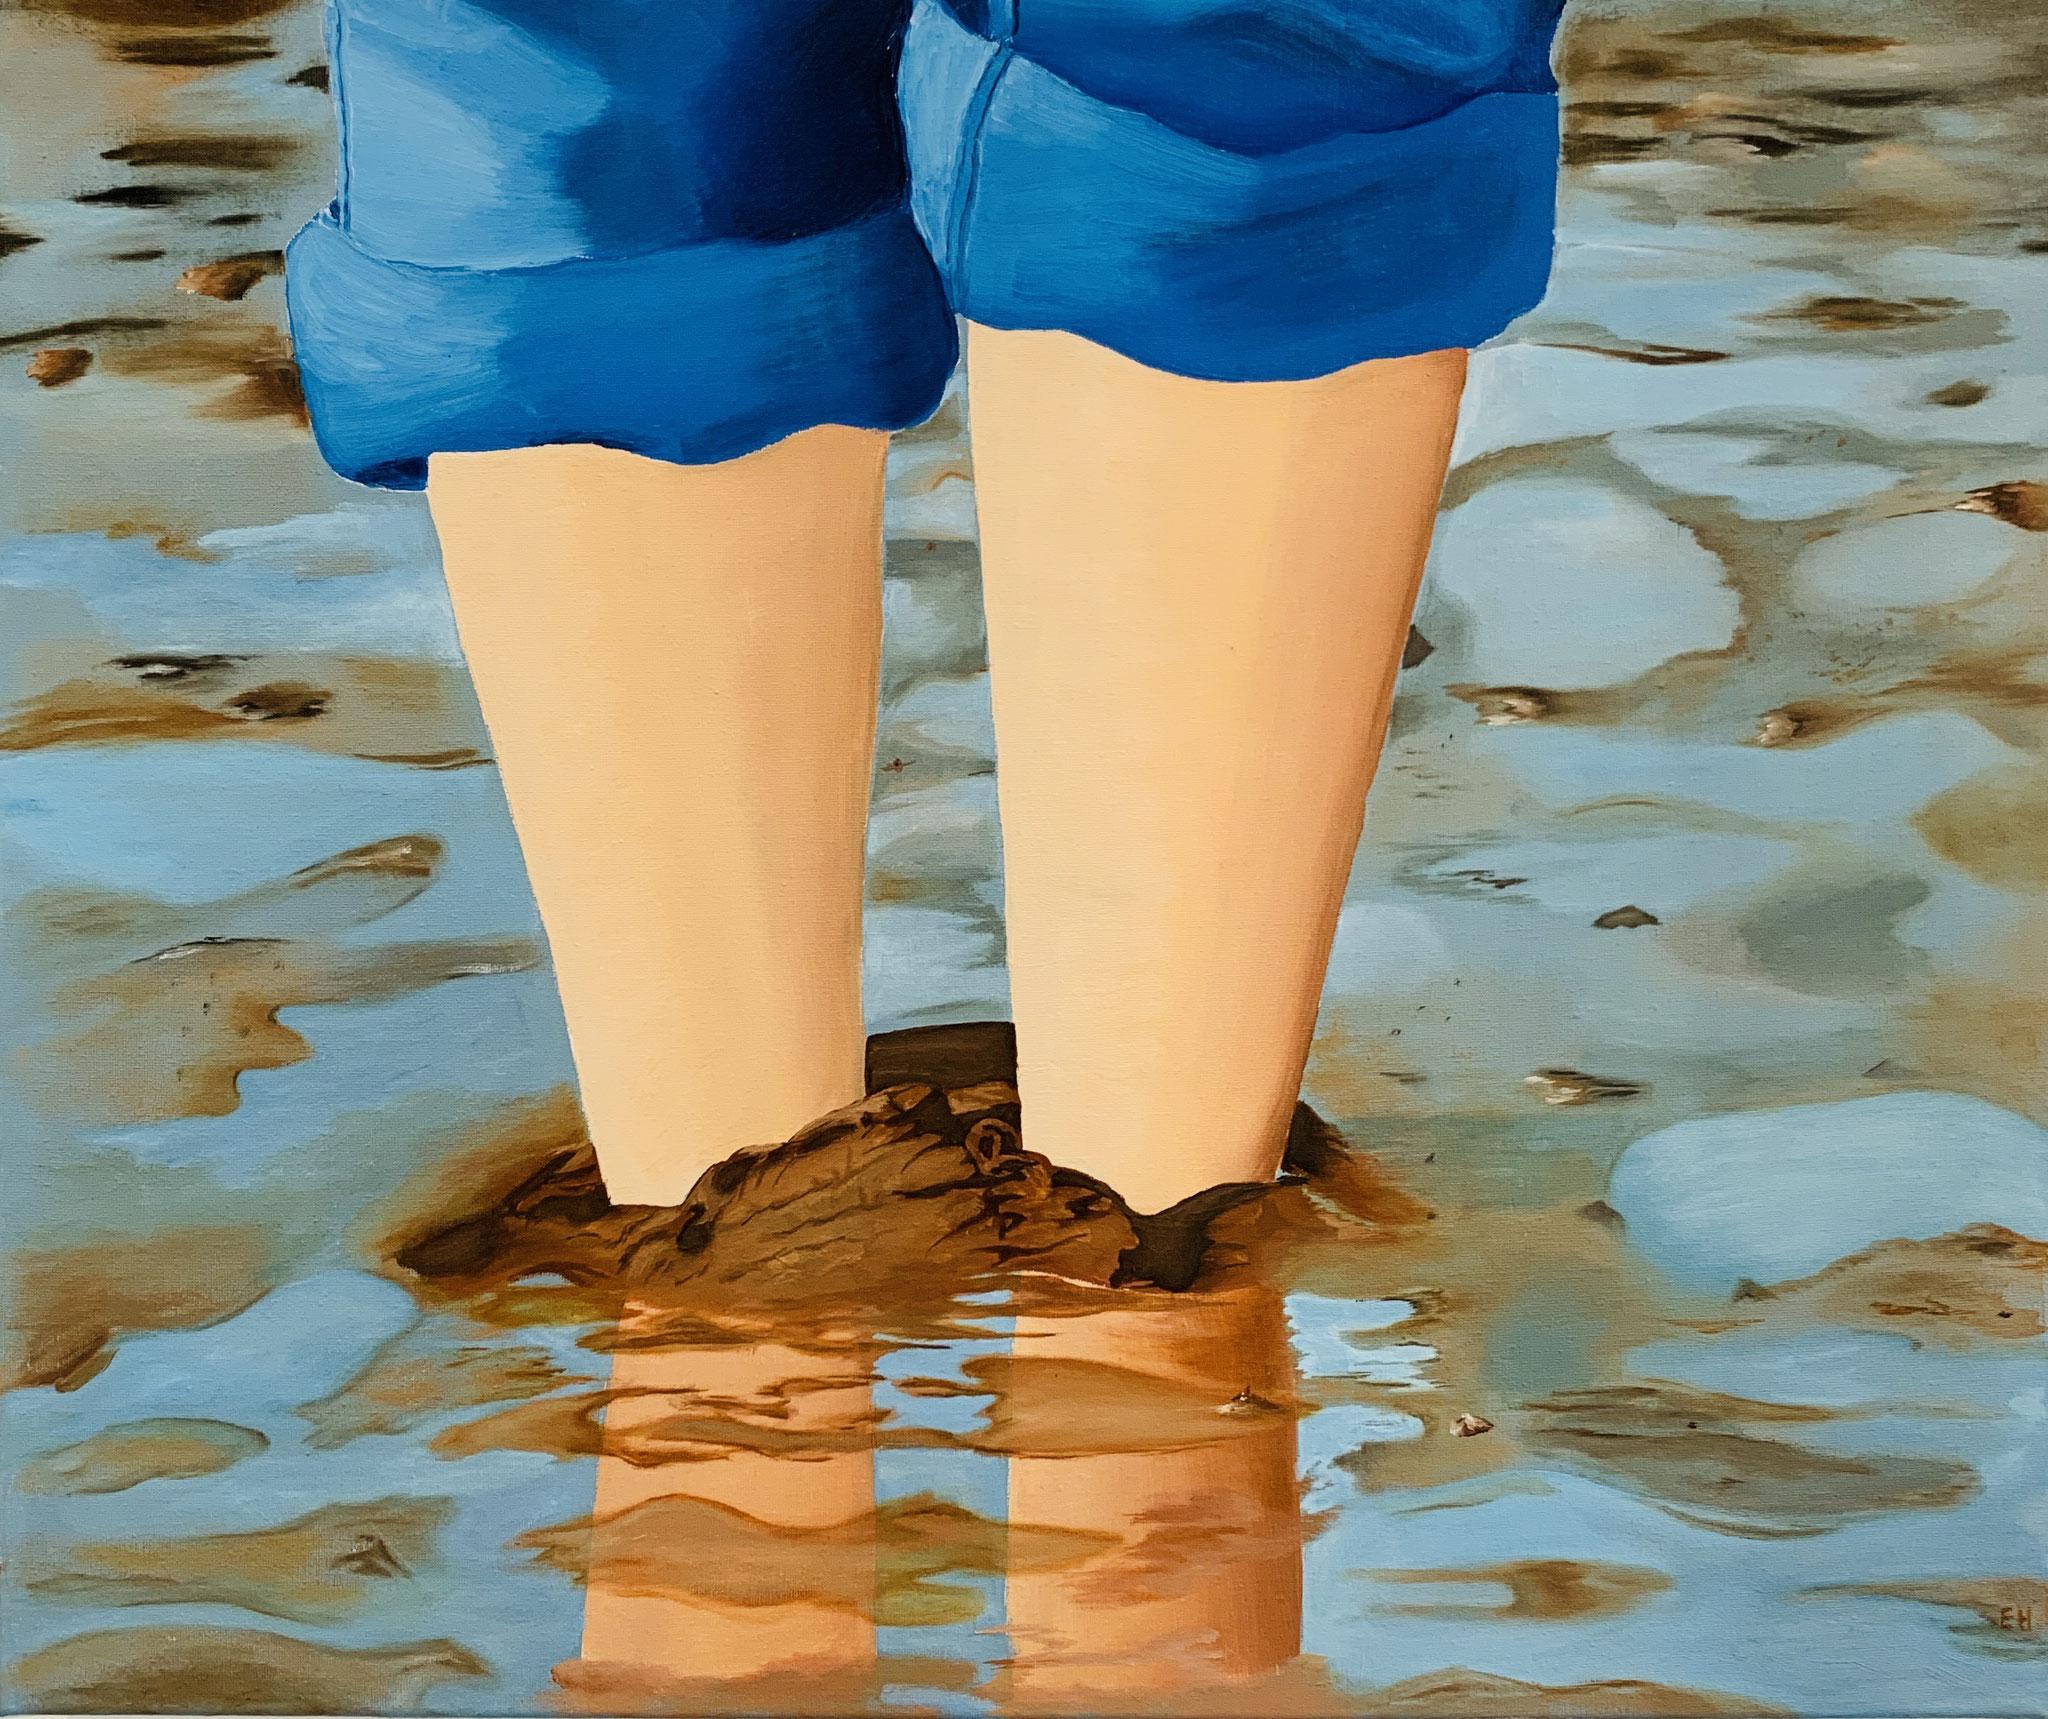 22. Elke Hassinger, ohne Titel, Öl auf Leinwand, 2020